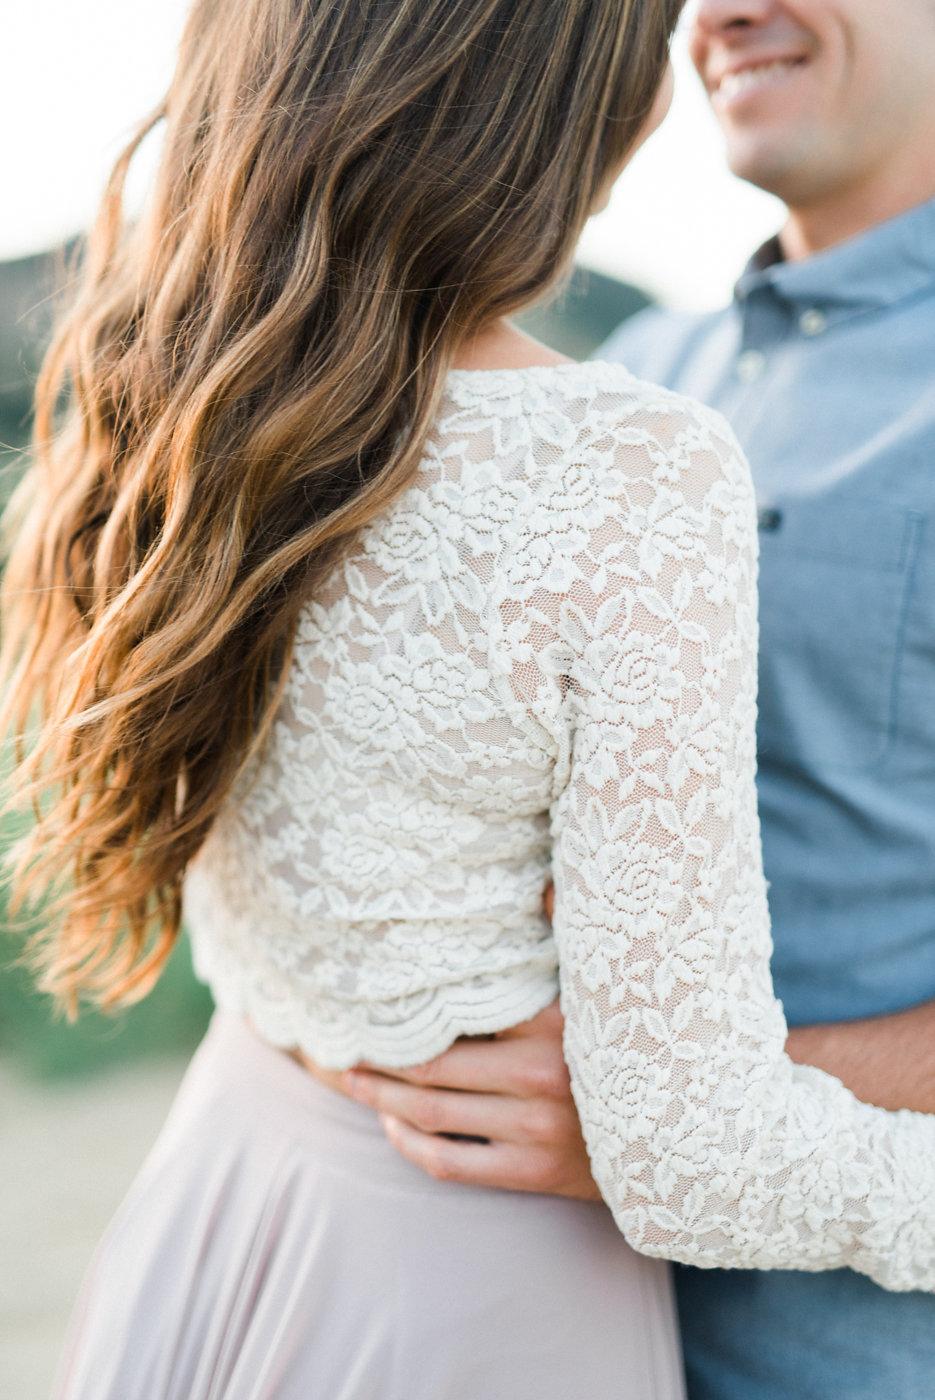 California Engagement Session | California Photographer | California Wedding | Fine Art Photography | Anya Kernes | Joy Wed | Fine Art Wedding Blog | Canadian Wedding Blog